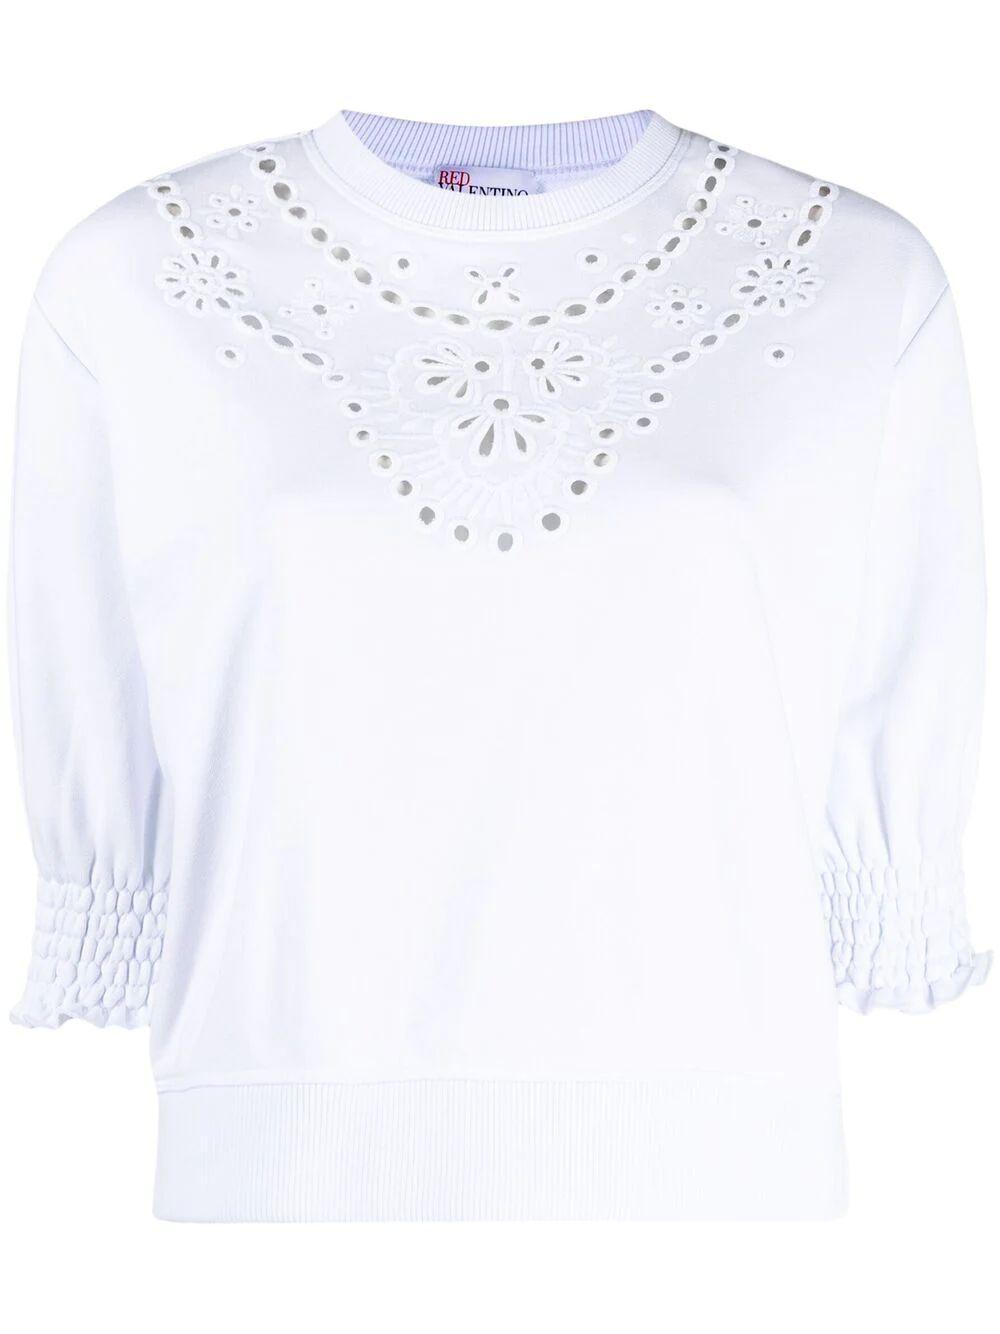 Embroidered Yoke Sweatshirt Item # VR0MF06K5W2